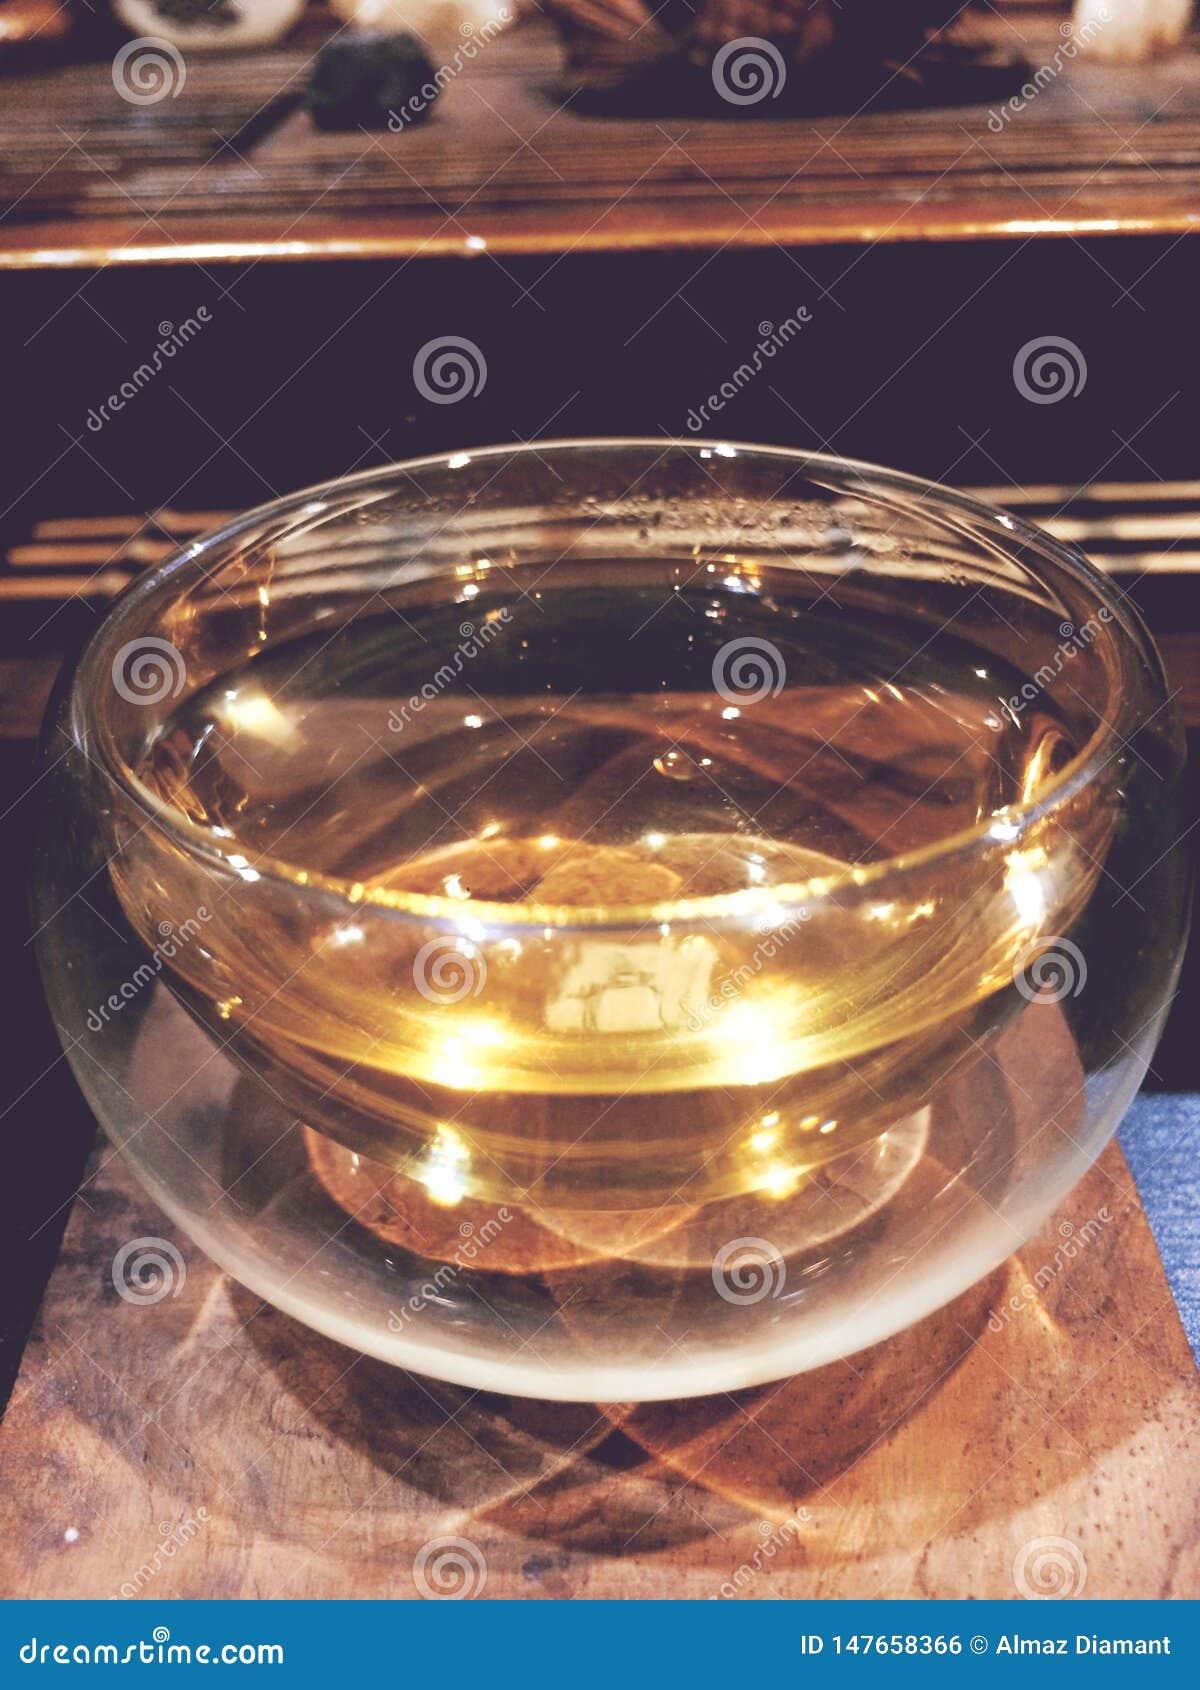 The tea ceremony, light small glass cup of tea